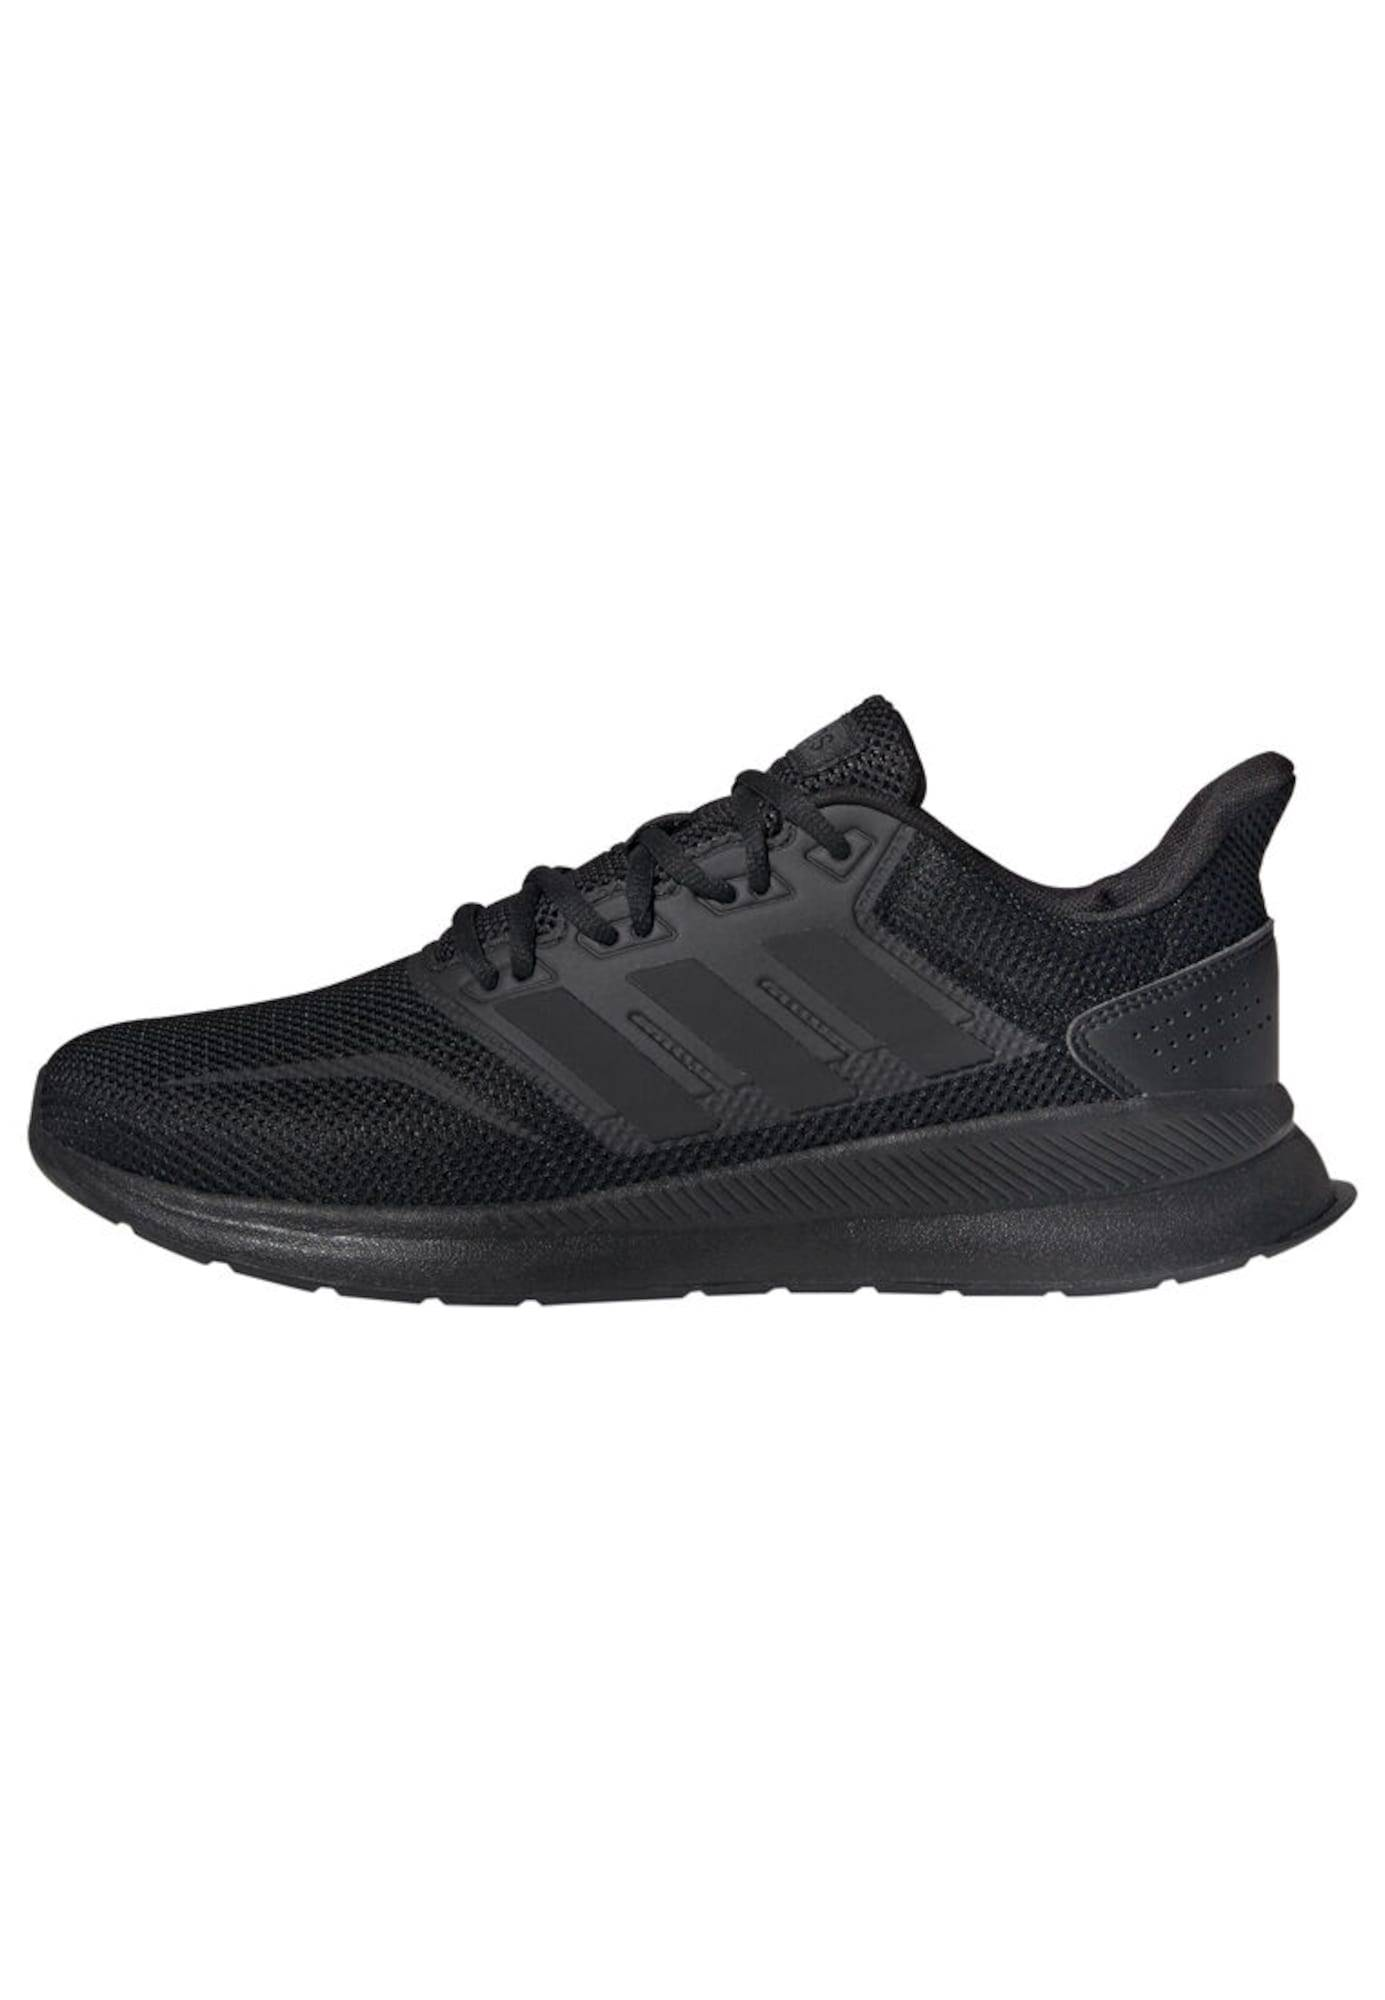 ADIDAS PERFORMANCE Chaussure de course 'Runfalcon'  - Noir - Taille: 7 - male